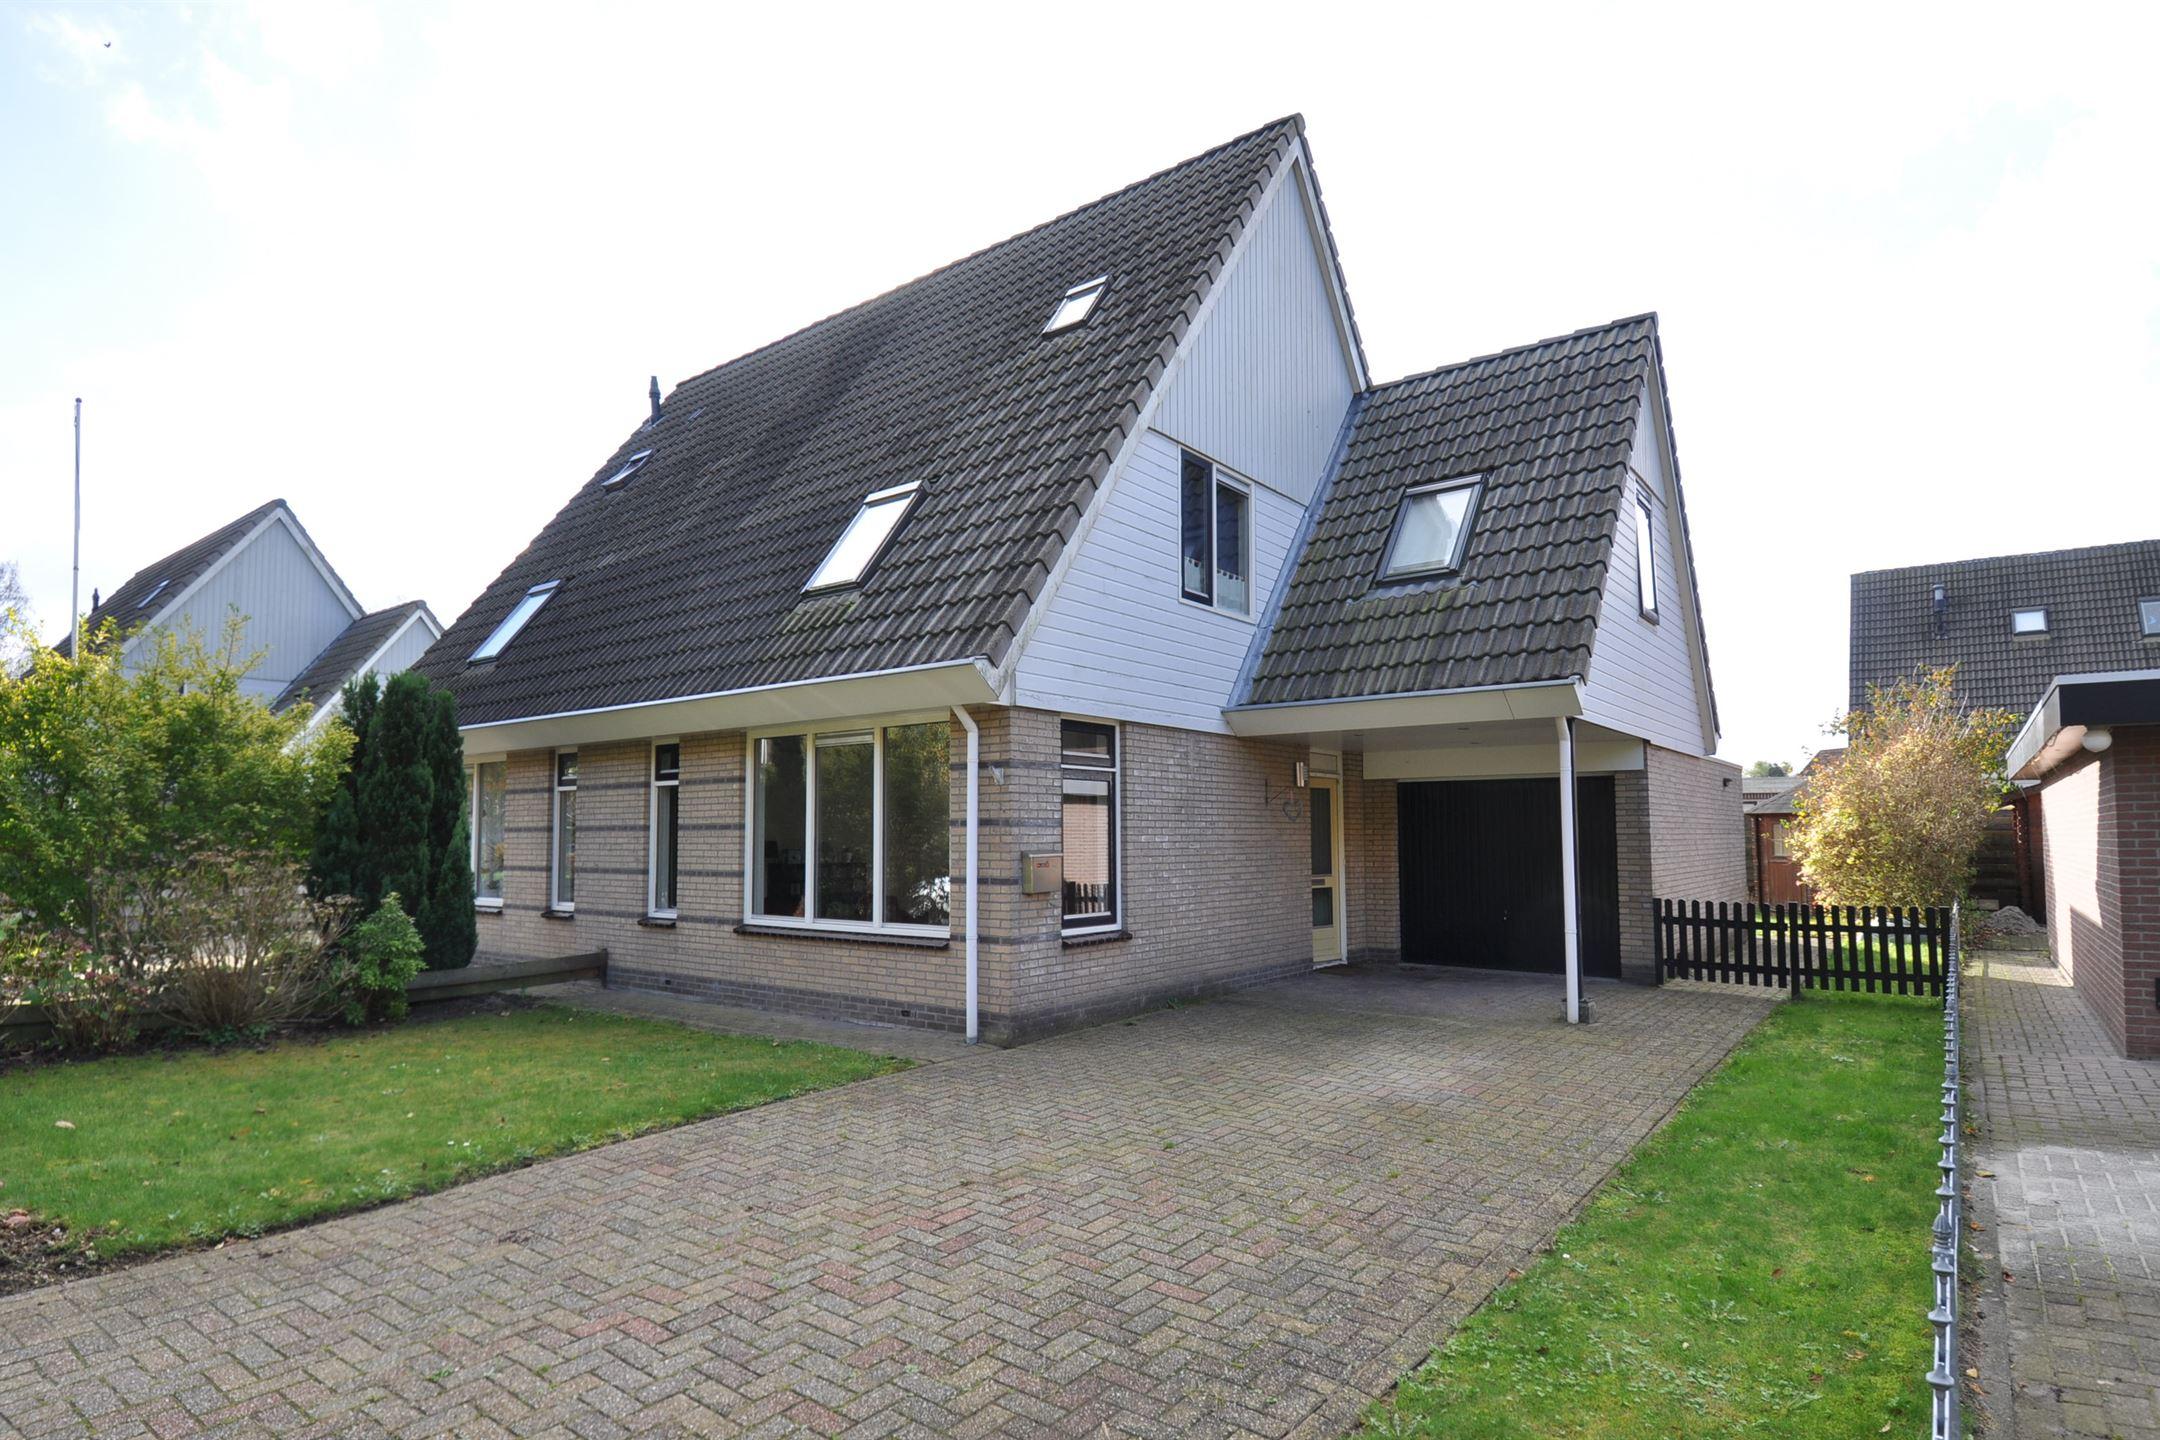 Huis te koop zwaluwstraat 16 9644 vv veendam funda - Huis vv ...